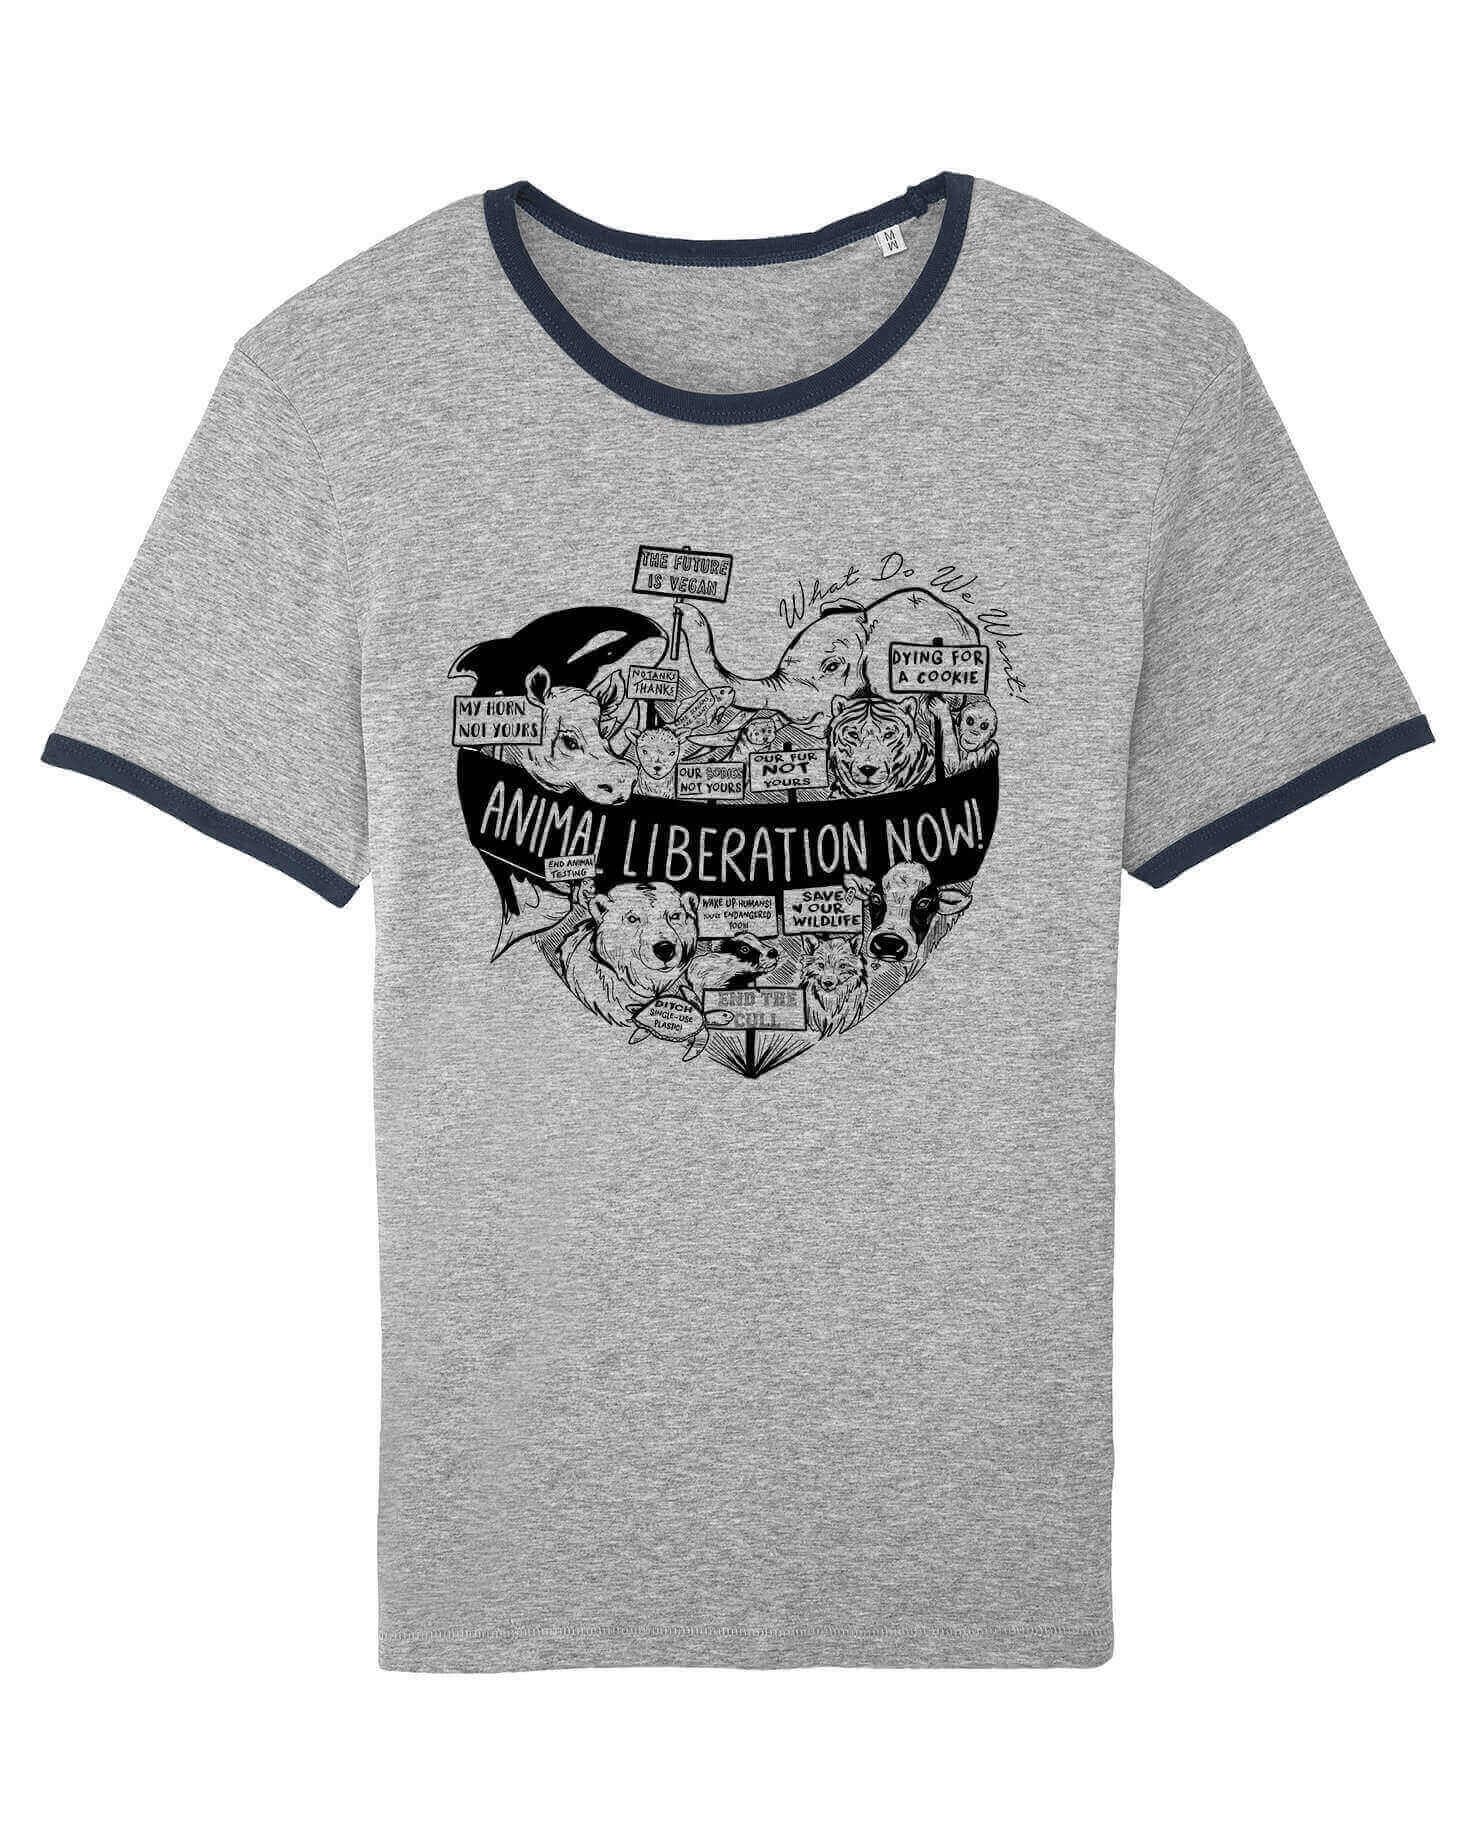 Unisex Tshirt : Animal Liberation GREY MARL